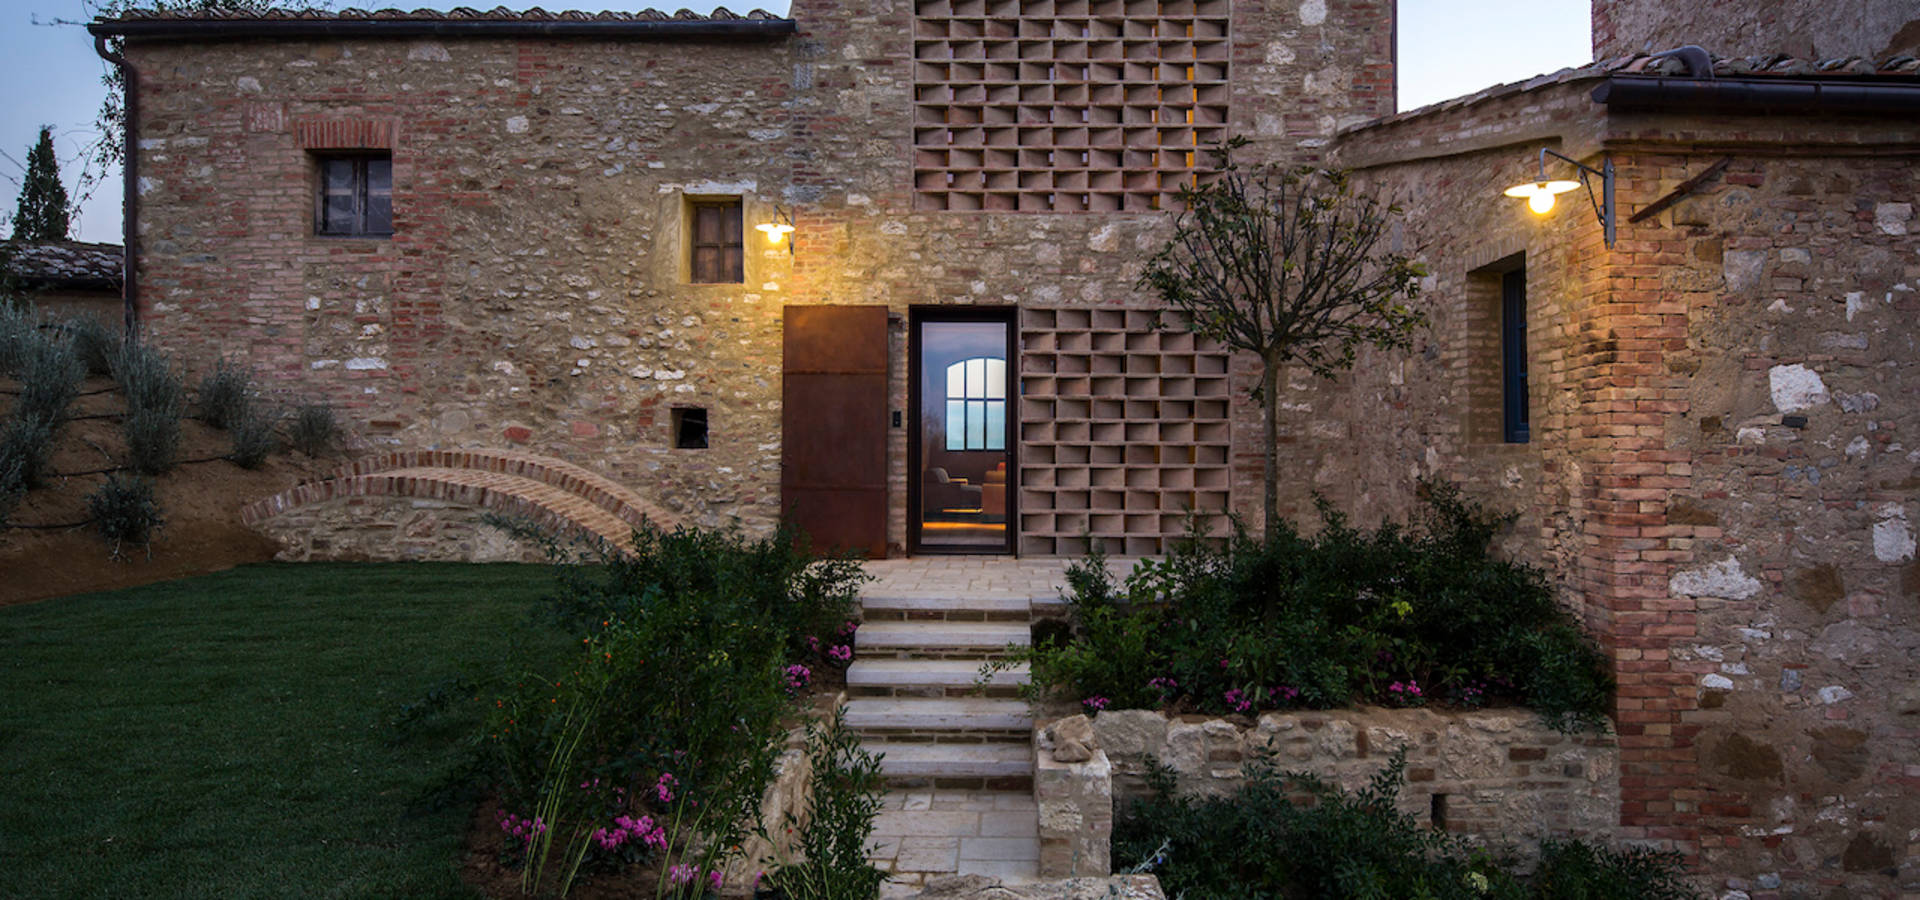 Ciclostile architettura architetti a bologna homify for Architettura in stile cottage